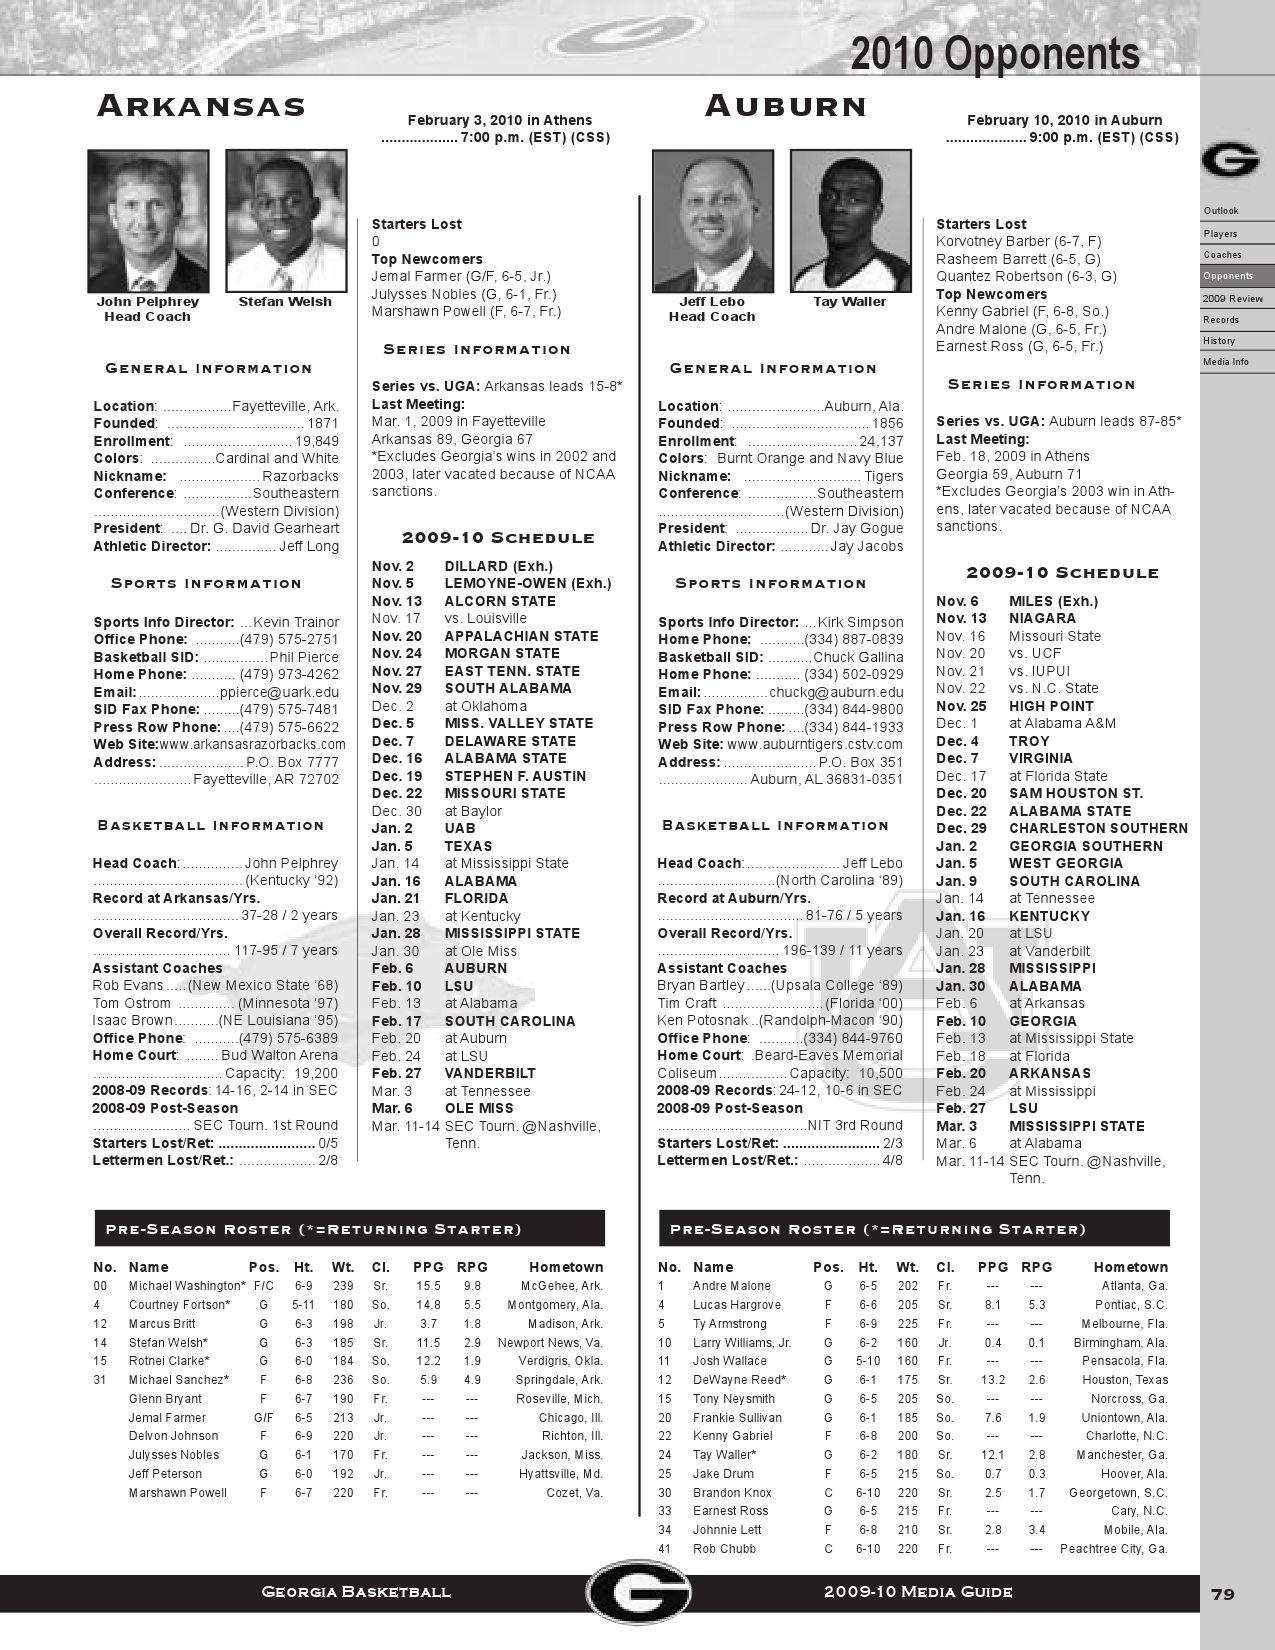 2010 Georgia Men's Basketball Media Guide by Georgia